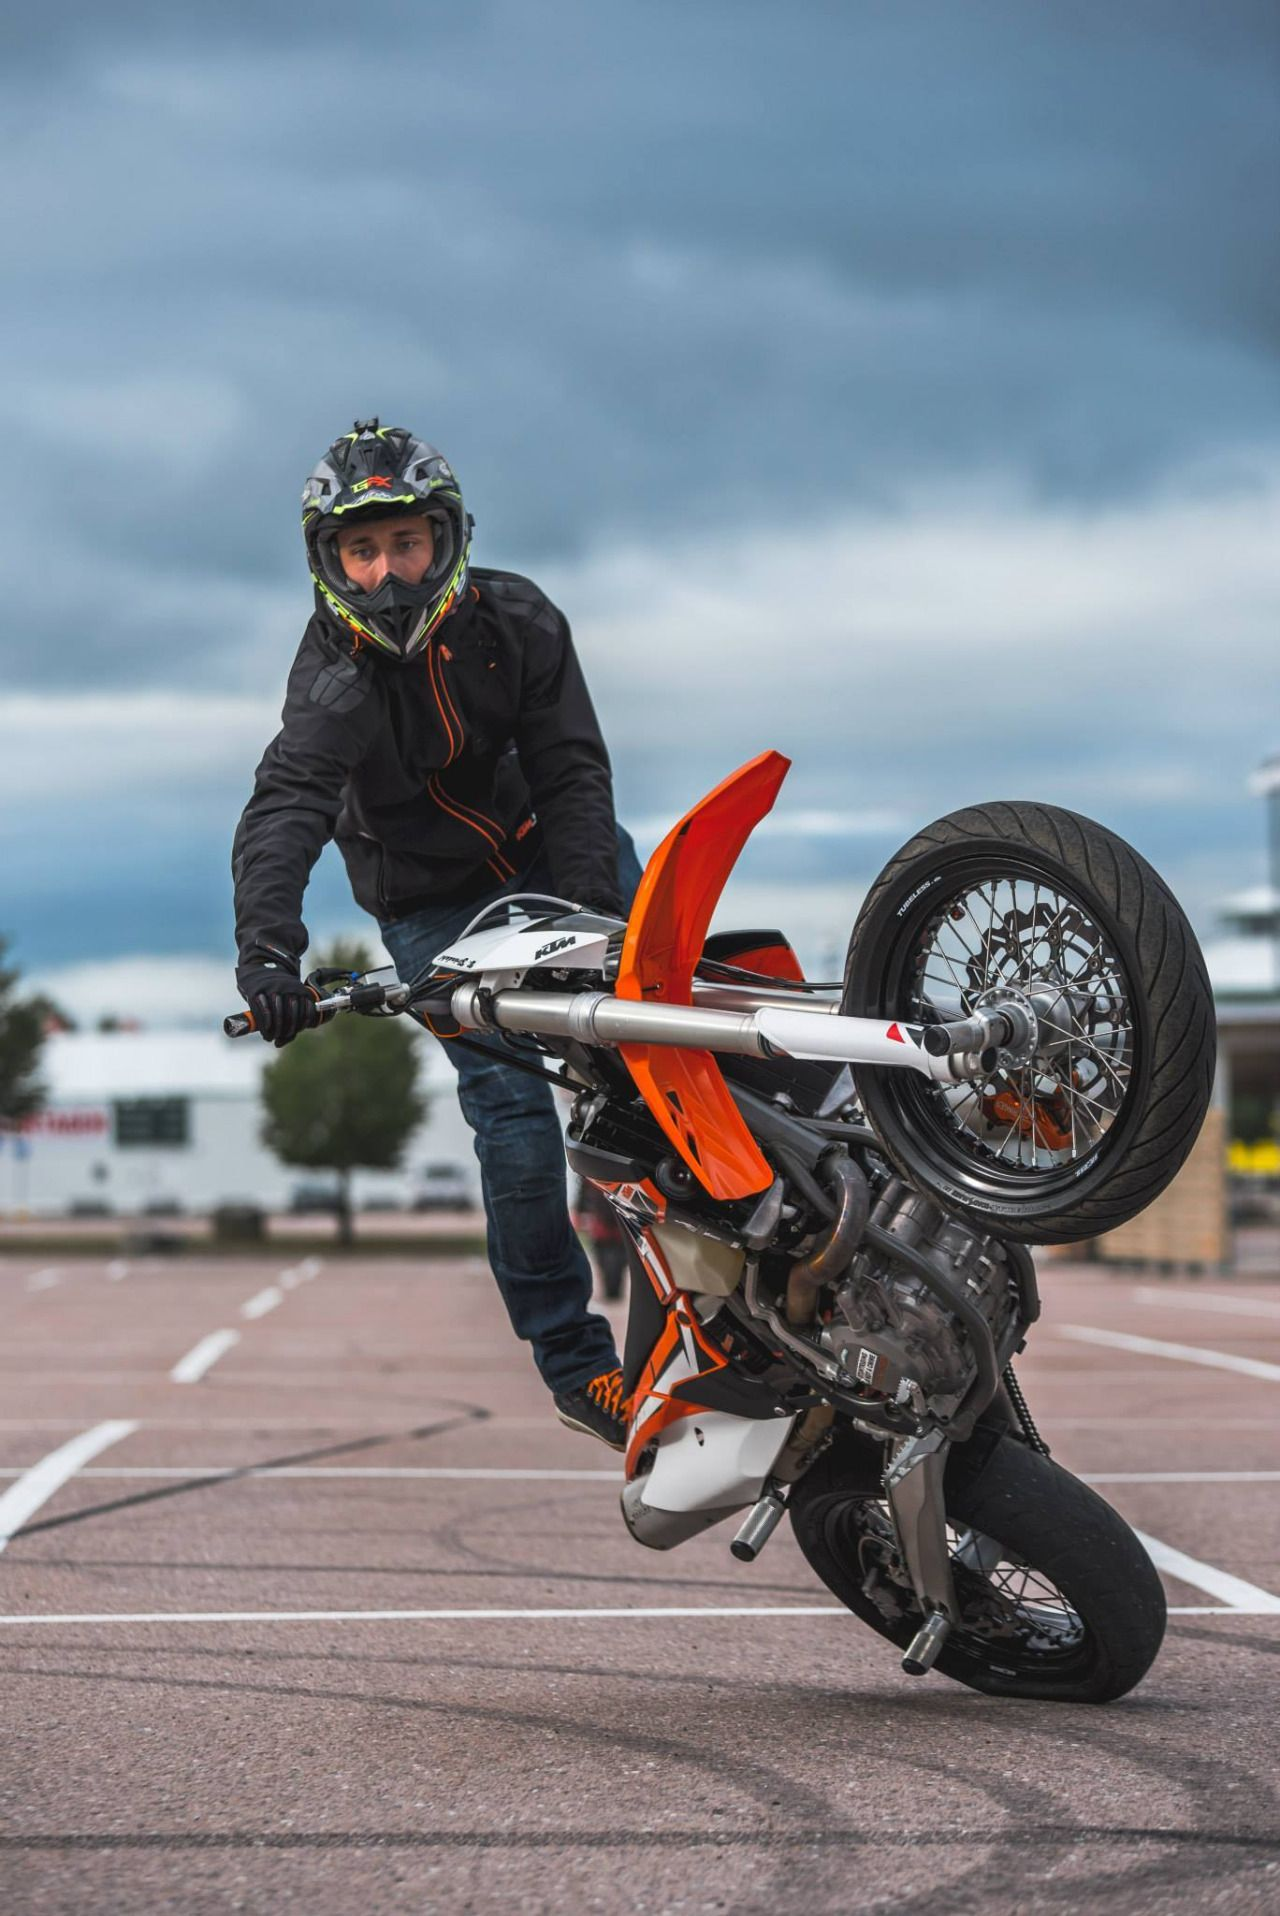 Honda Supermoto Stunt Parts - Exploring Mars